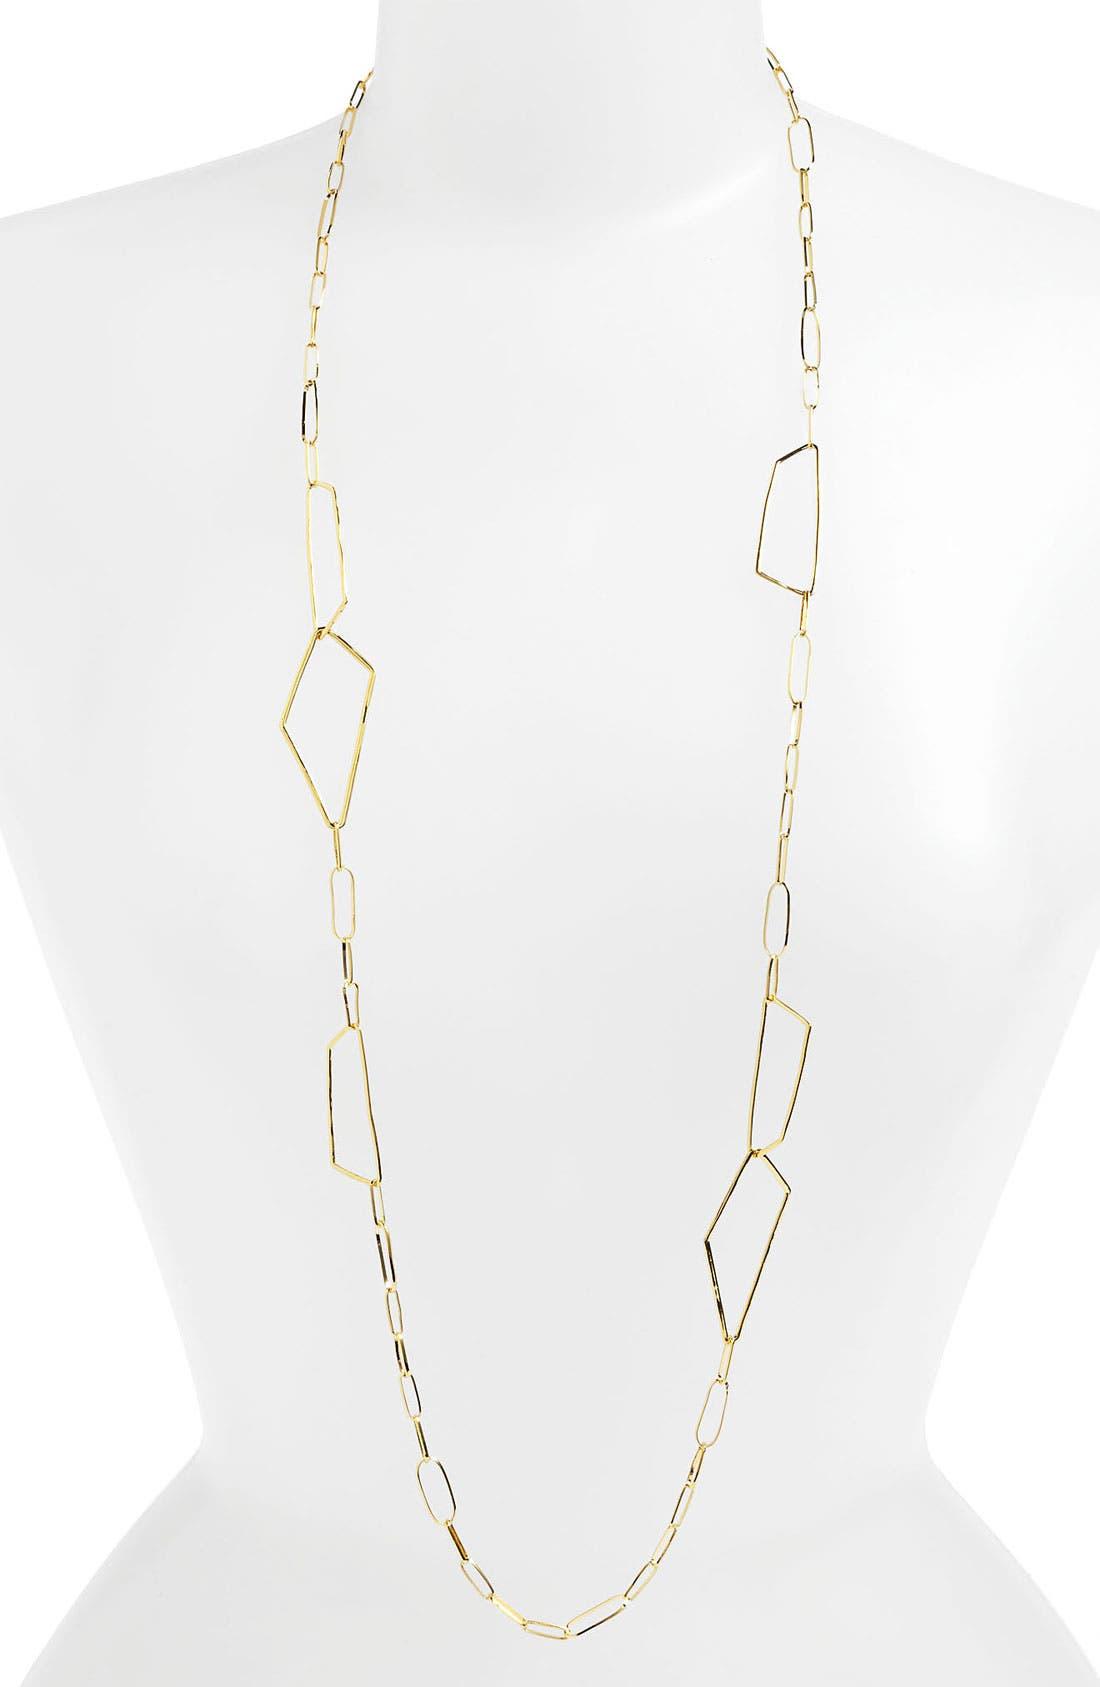 Alternate Image 1 Selected - Alexis Bittar 'Miss Havisham - New Wave' Long Link Necklace